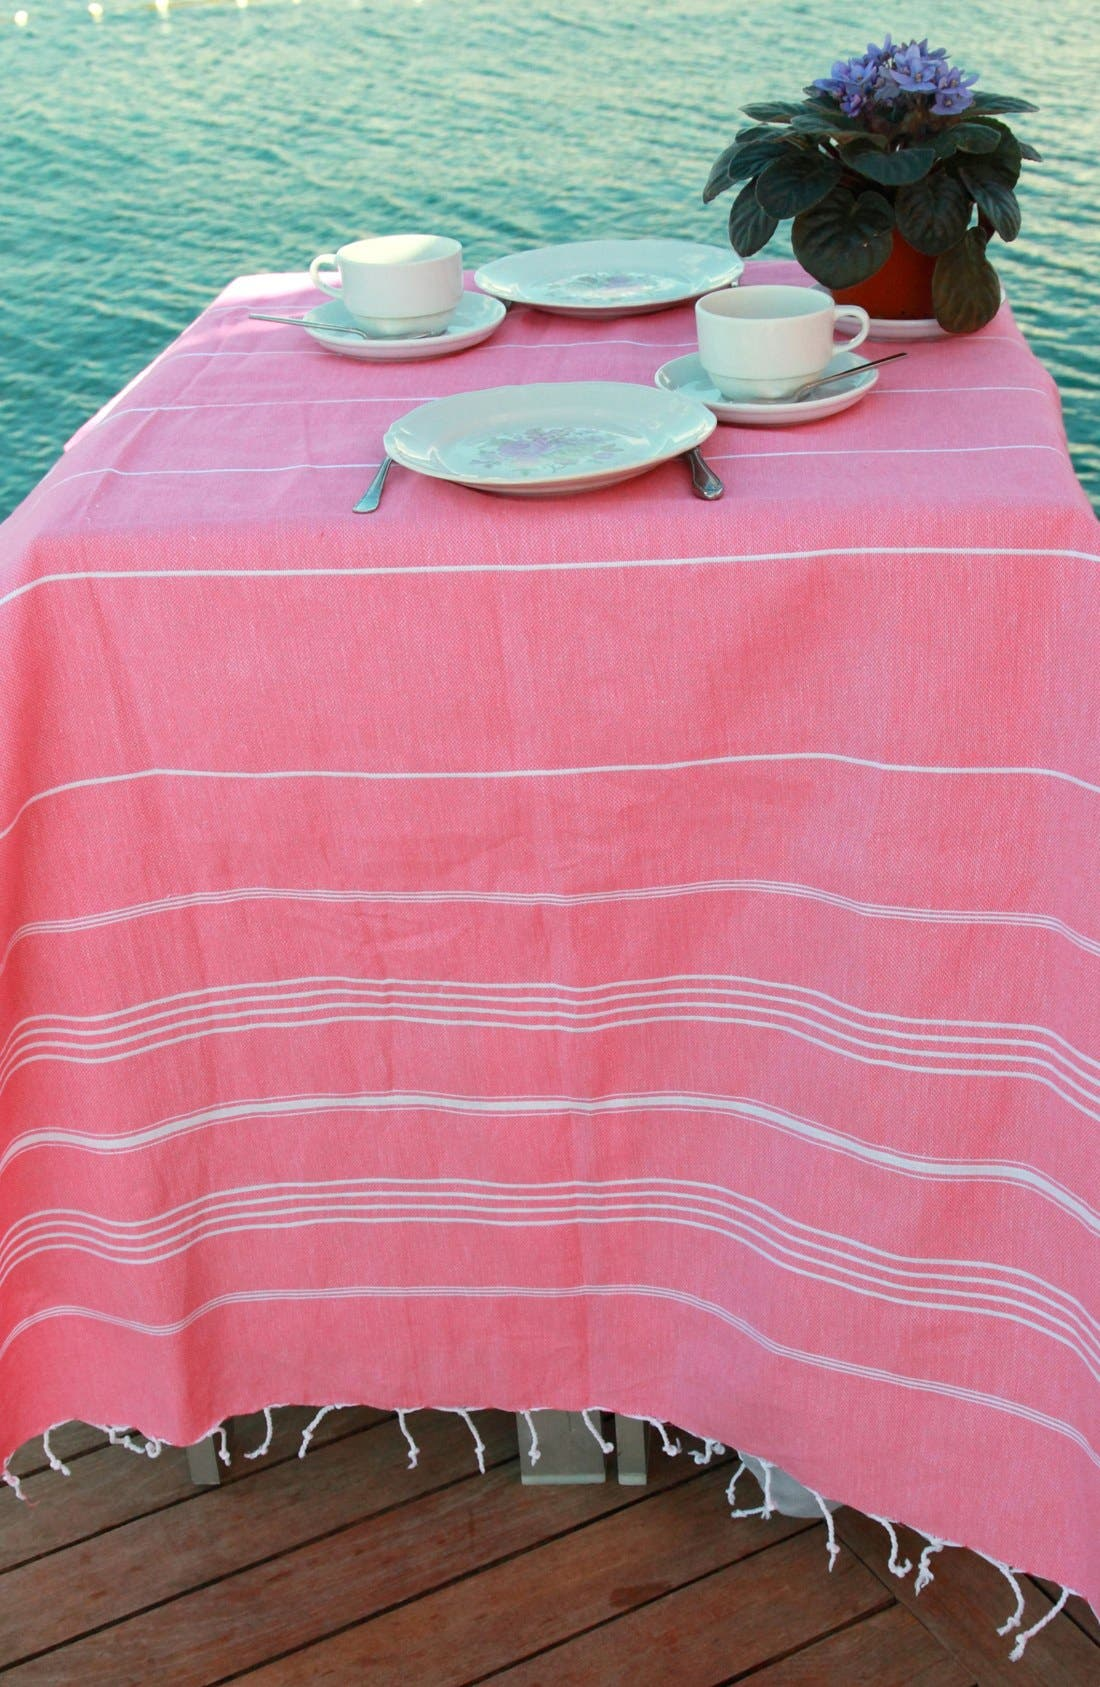 Alternate Image 3  - Linum Home Textiles 'Lucky' Turkish Pestemal Towel